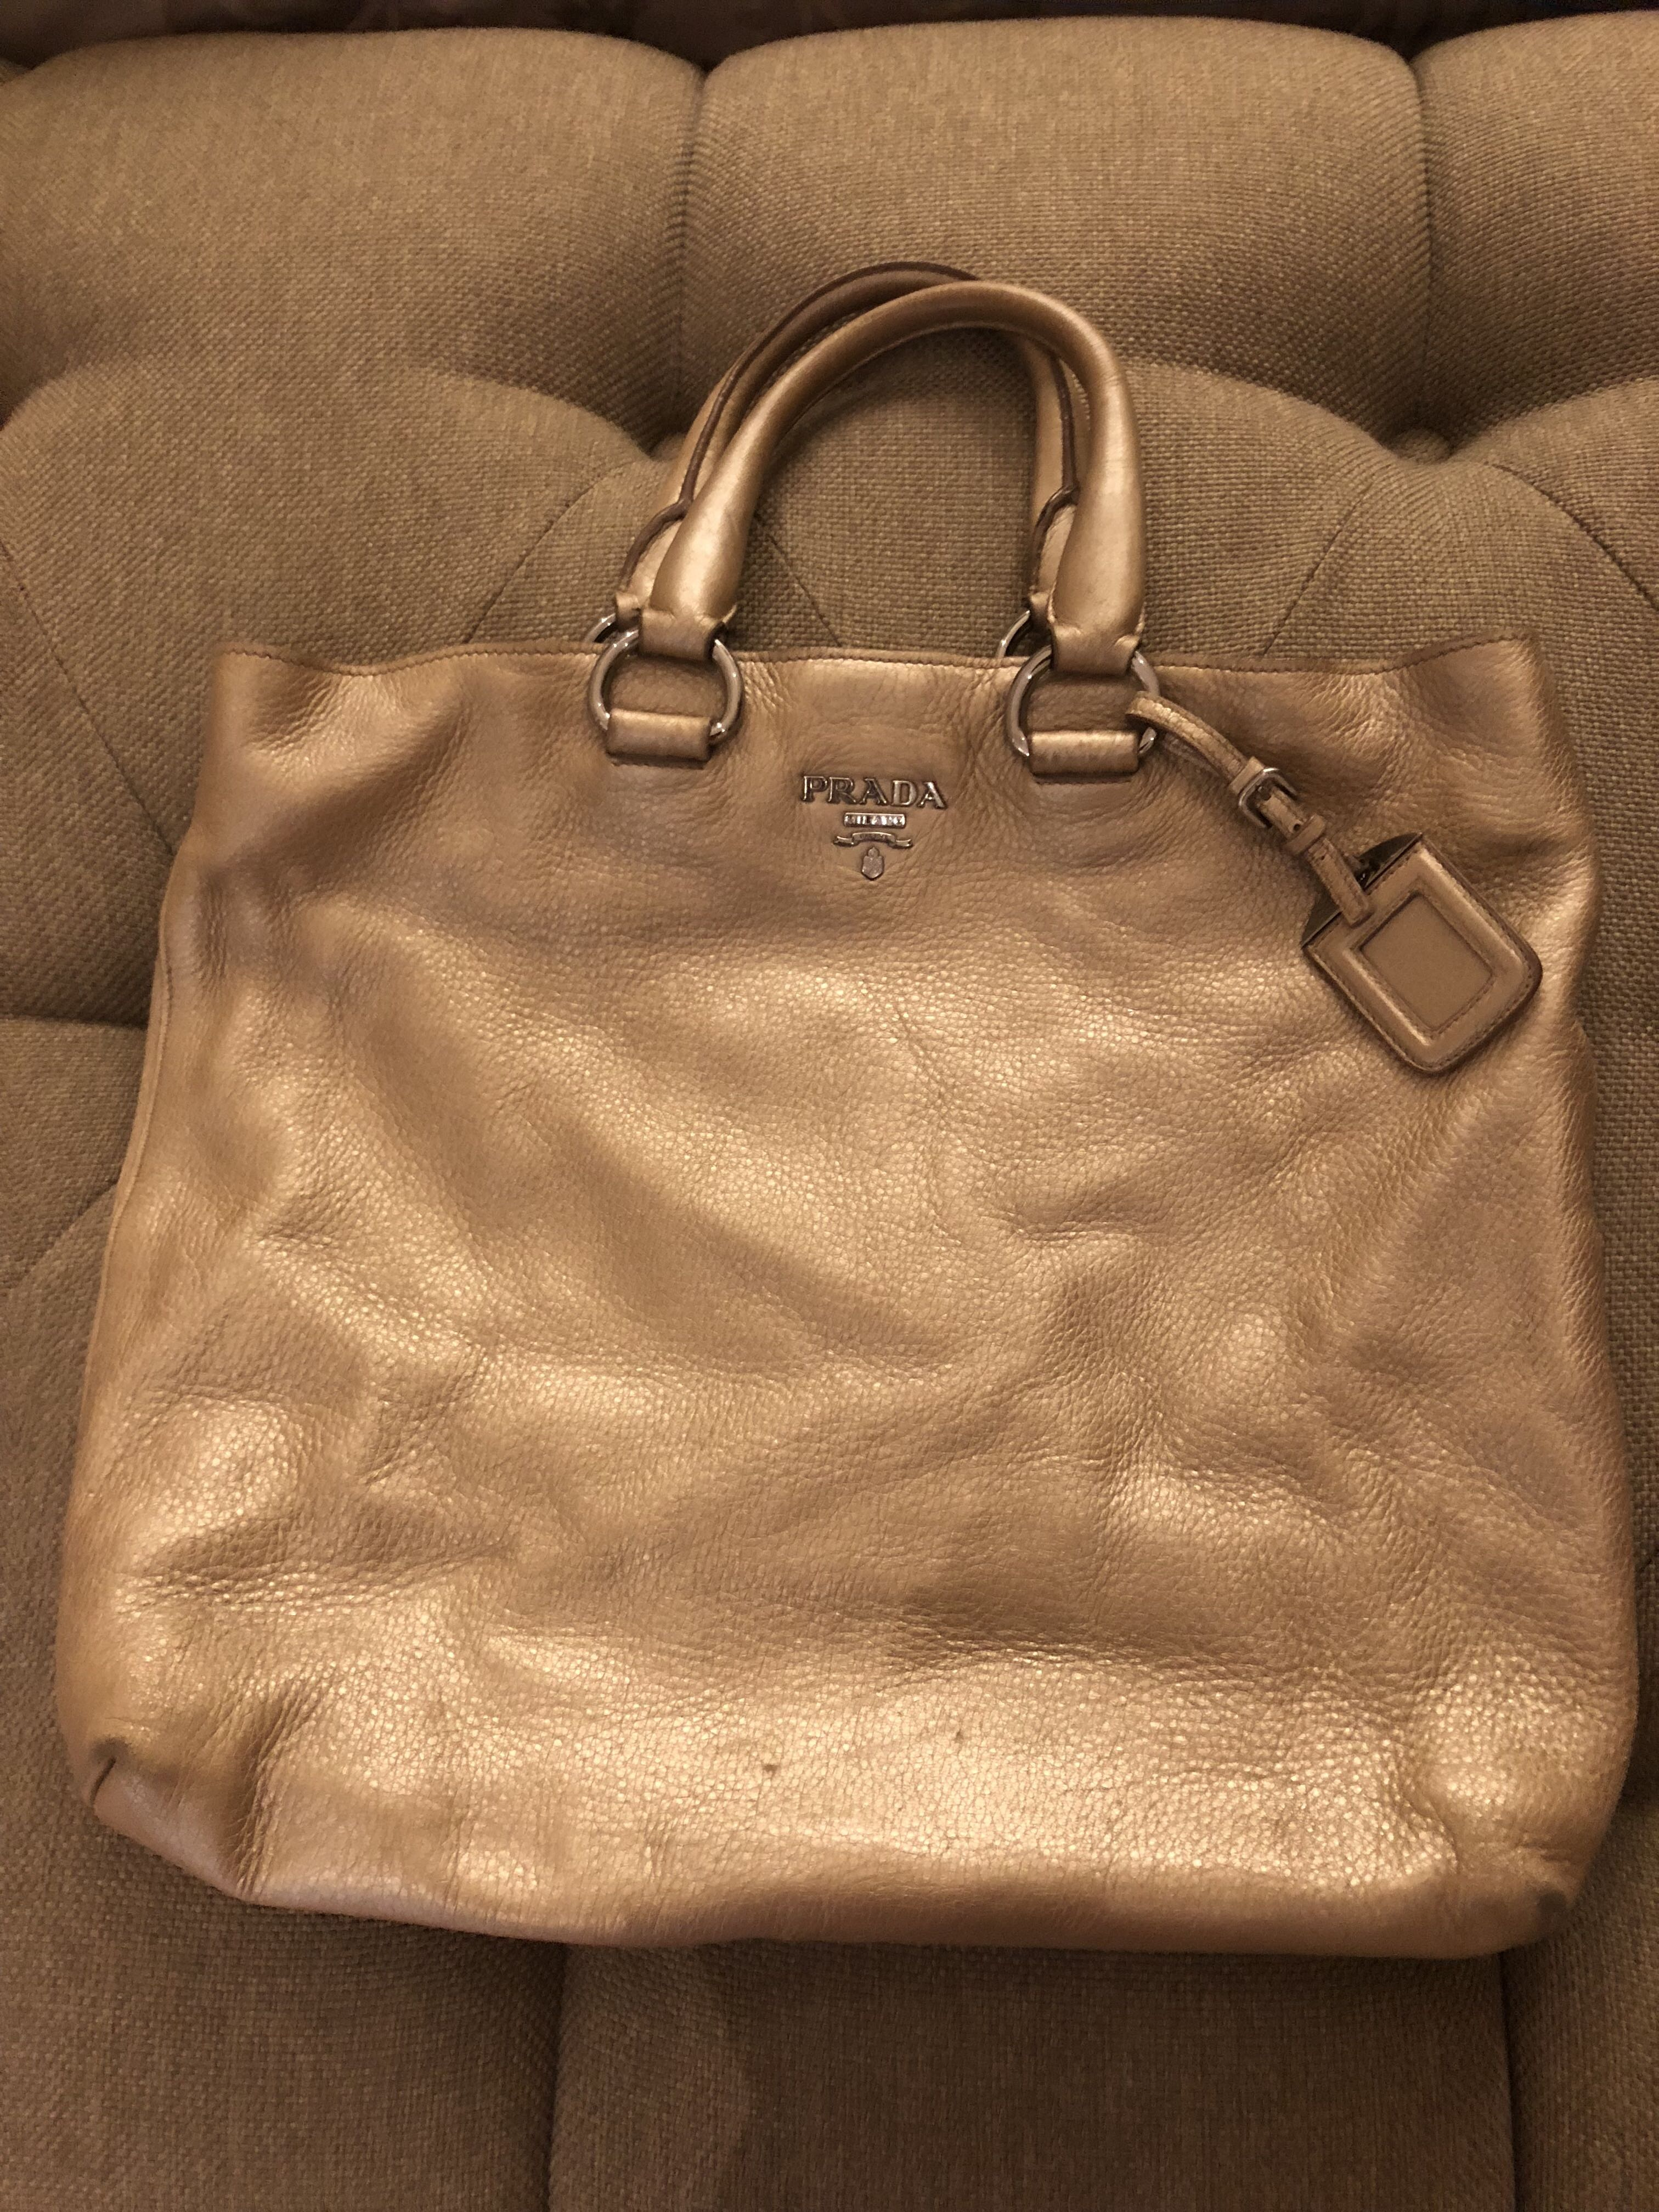 9e571a8f3cf032 new arrivals authentic prada tote bag preloved fesyen wanita tas dompet di  bbef4 61203